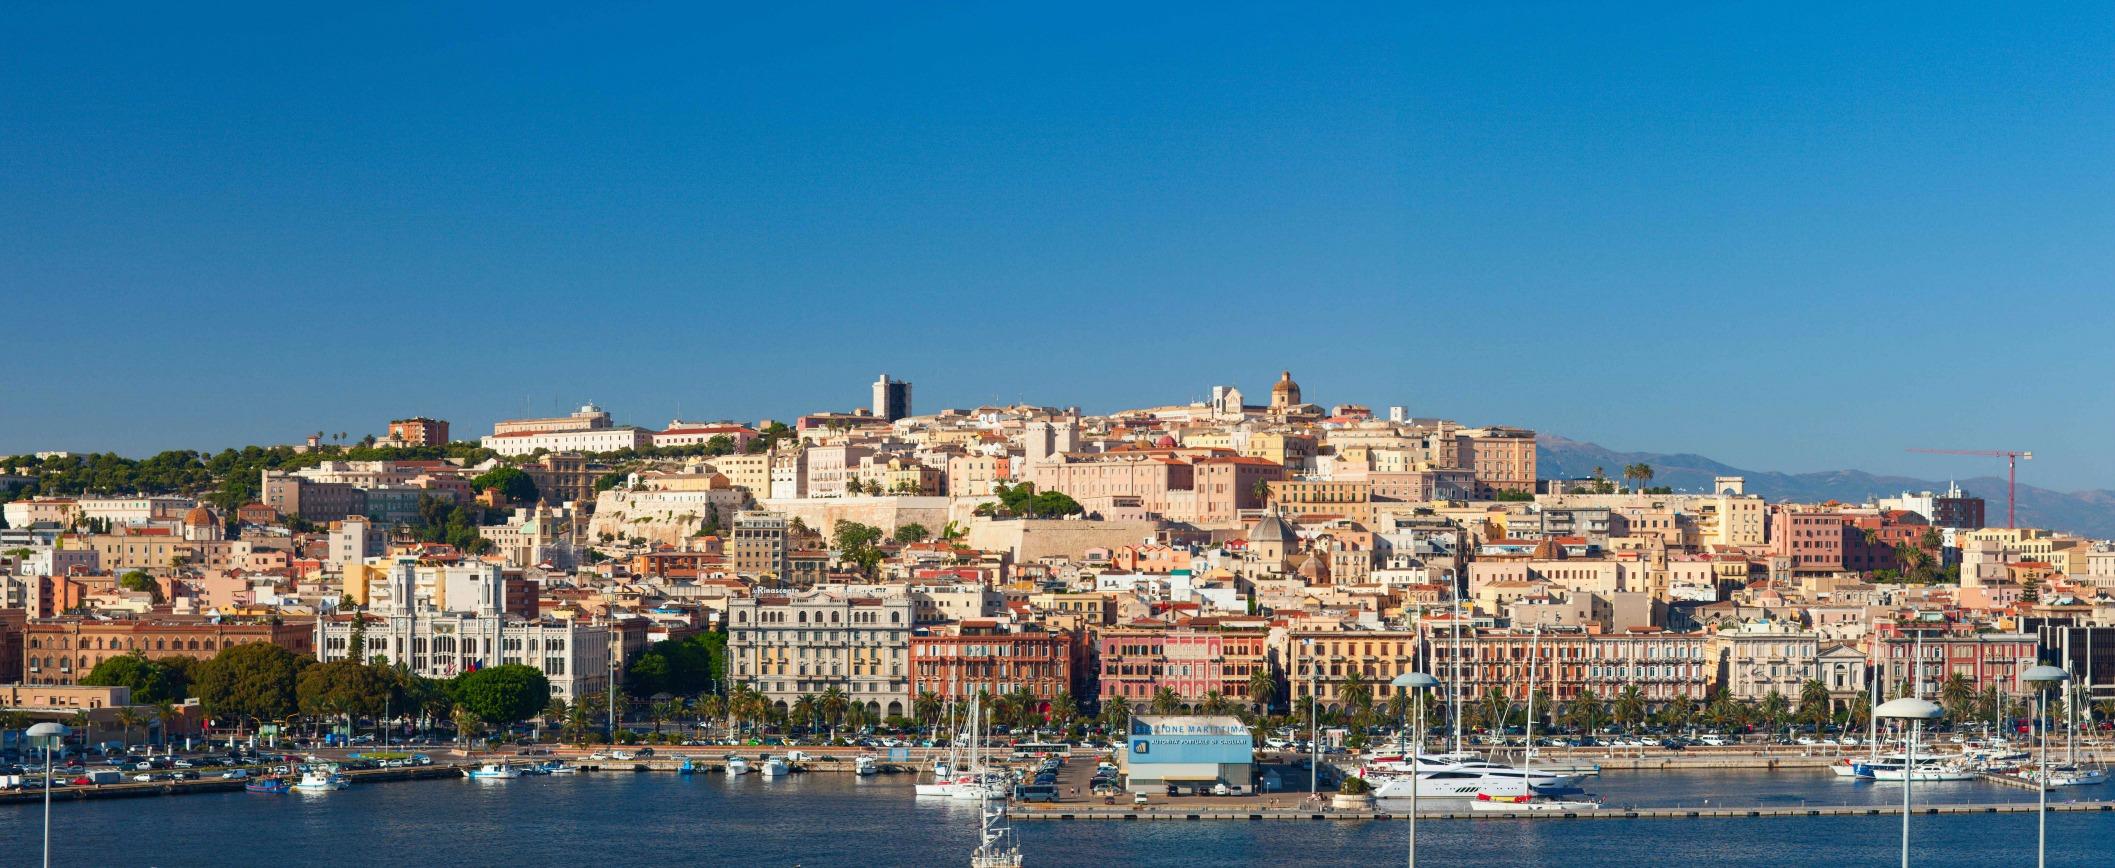 south Cagliari Sardinia